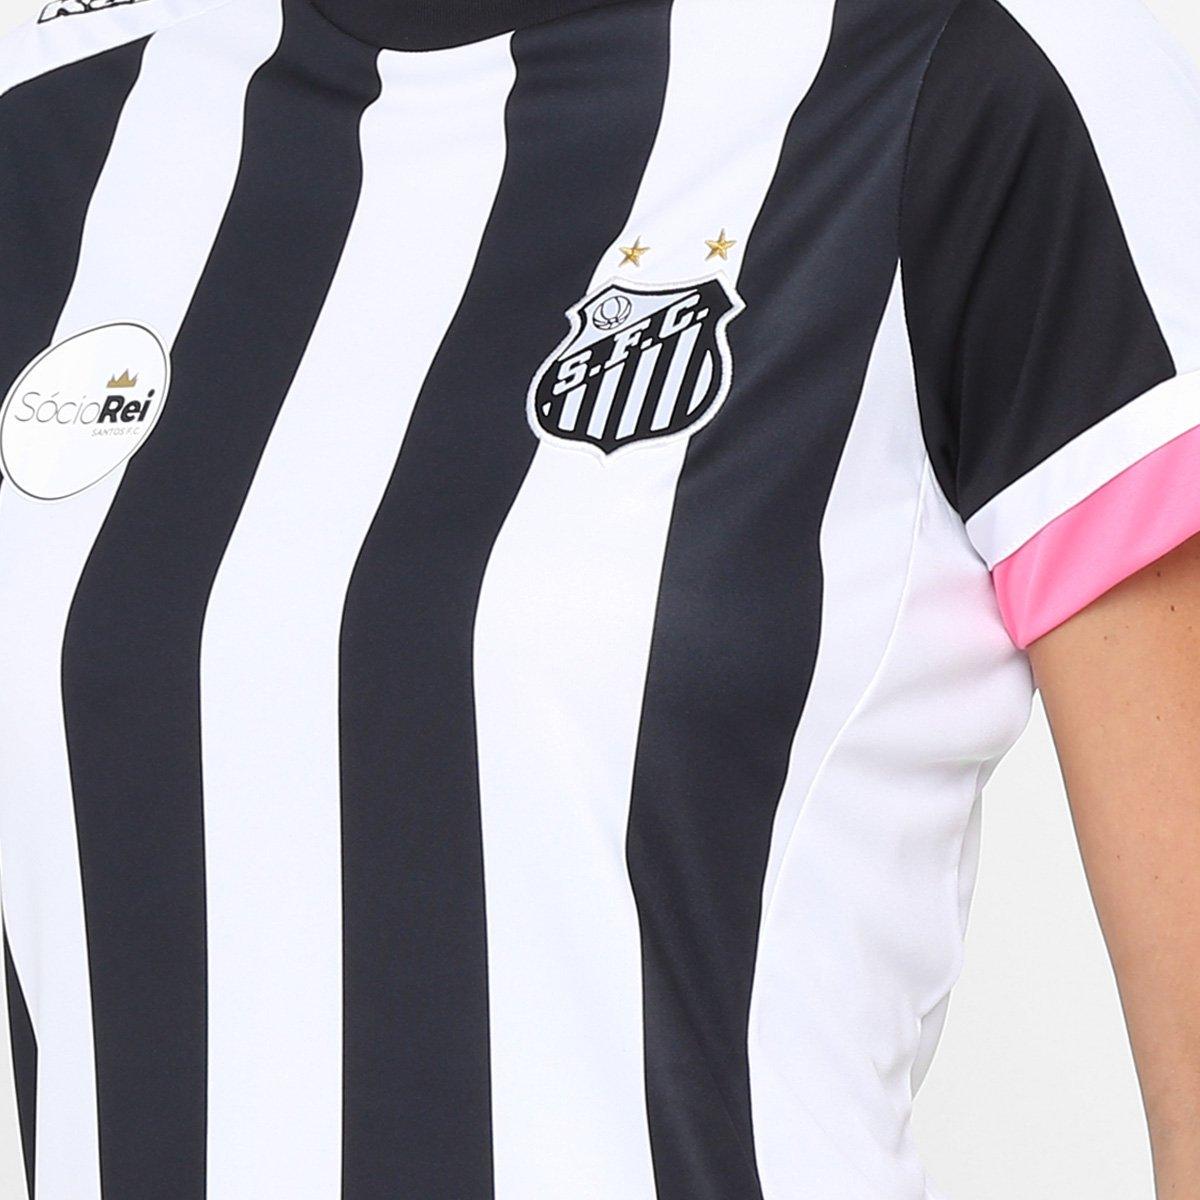 c6e26b1f37807 Camisa Santos II Réplica 17 18 s nº Torcedor Kappa Feminina - Preto e Branco